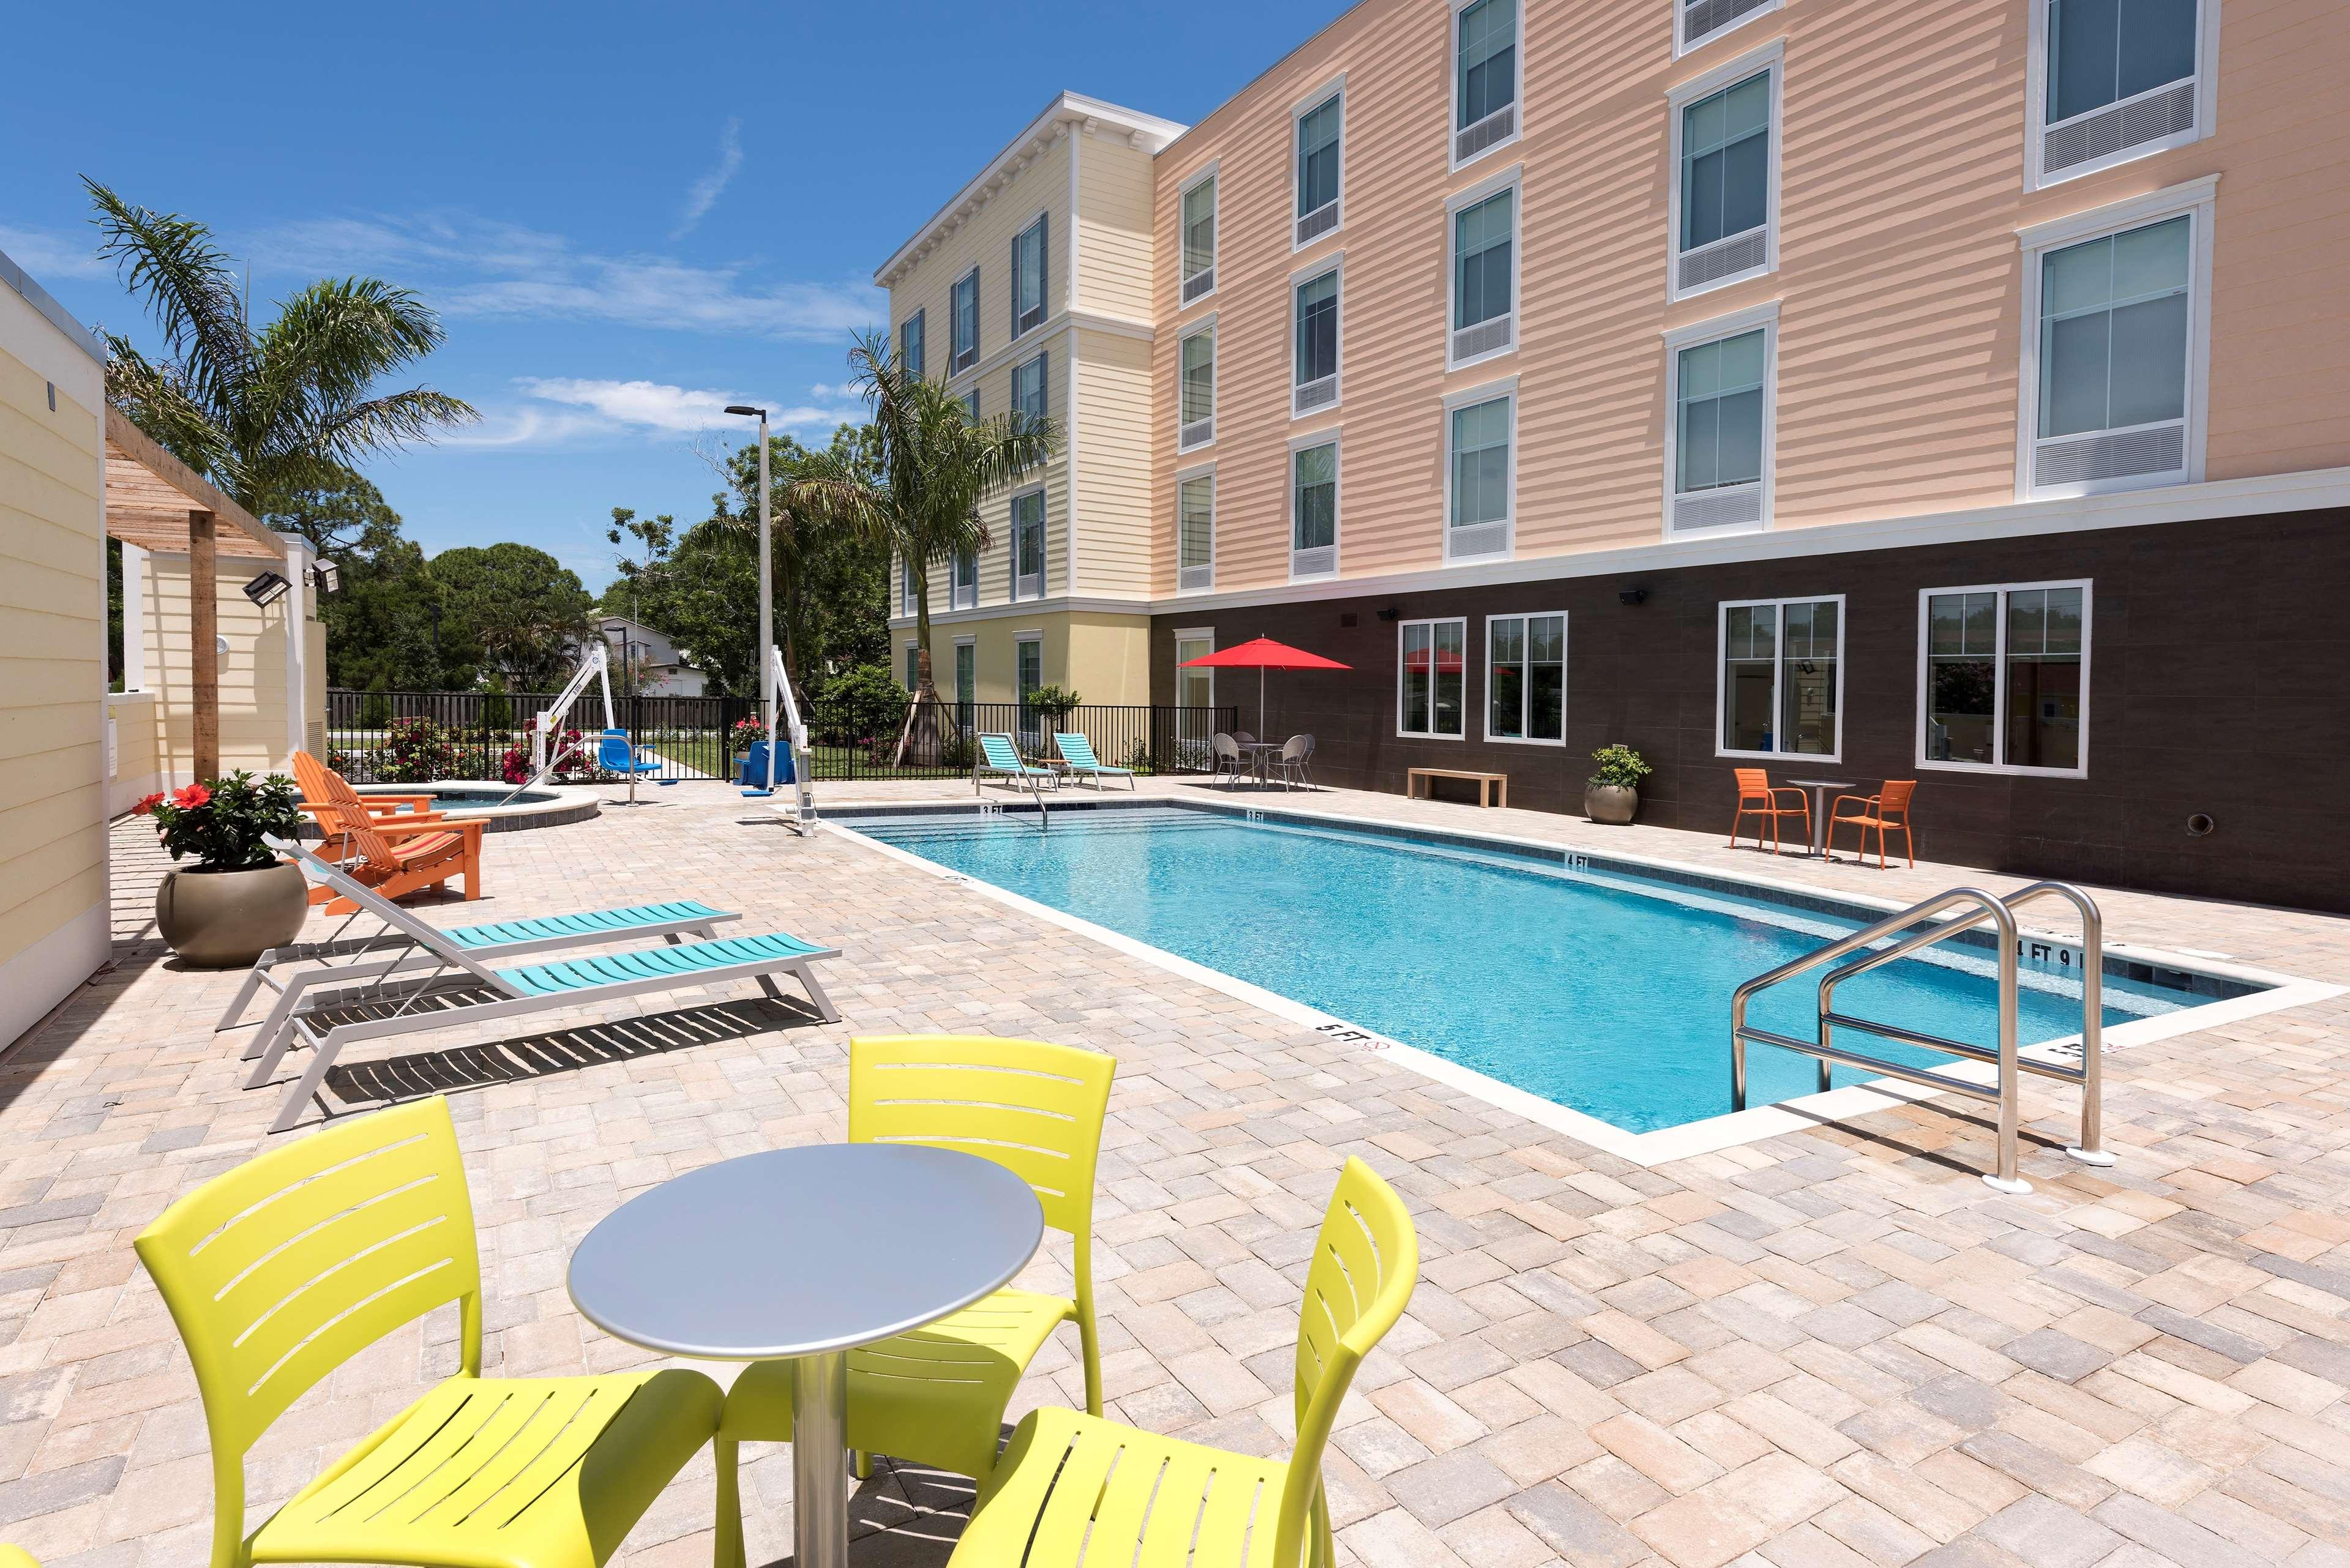 Home2 Suites by Hilton Nokomis Sarasota Casey Key image 9